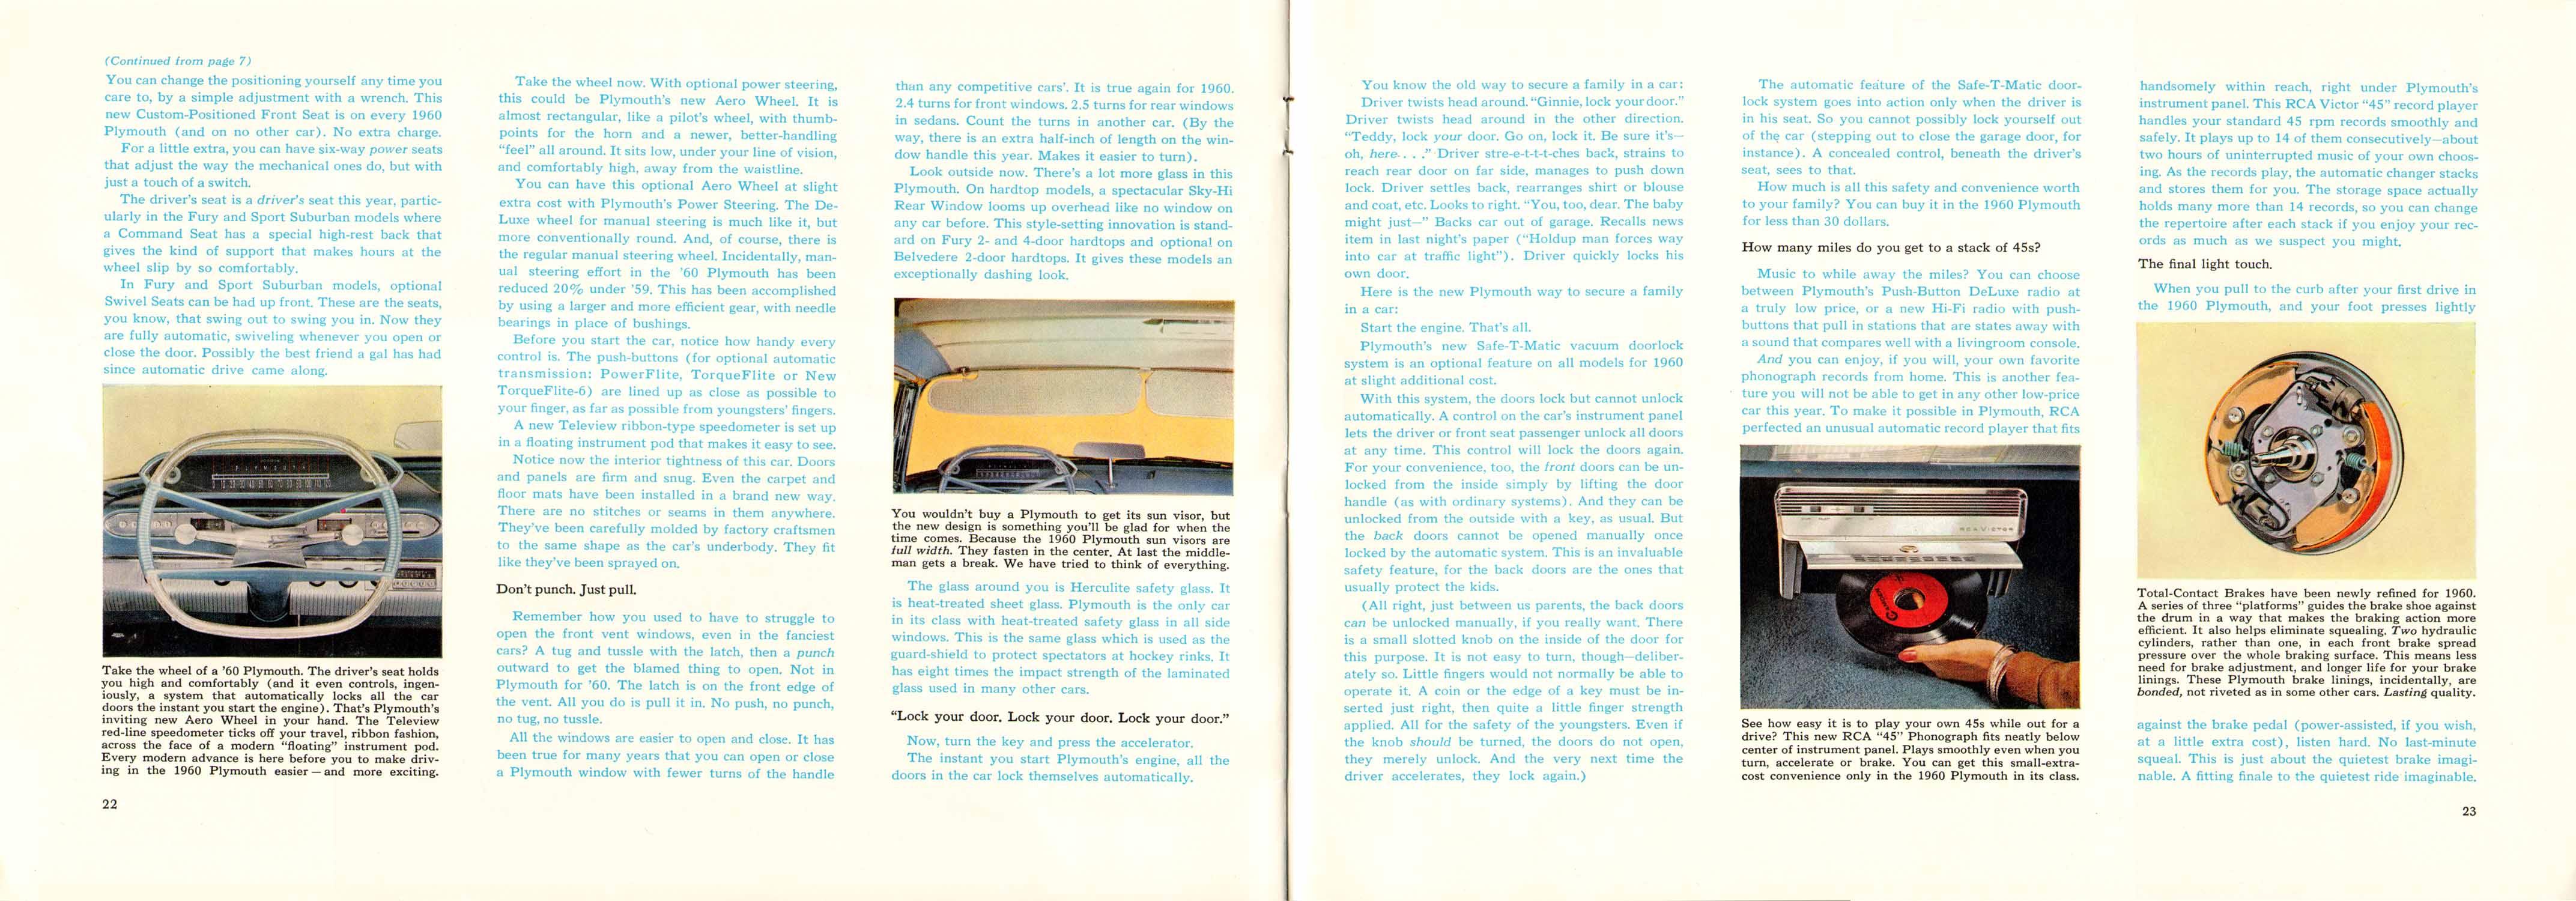 http://www.oldcarbrochures.com/static/NA/Plymouth/1960%20Plymouth/1960_Plymouth_Prestige_Brochure/1960%20Plymouth%20Prestige-22-23.jpg